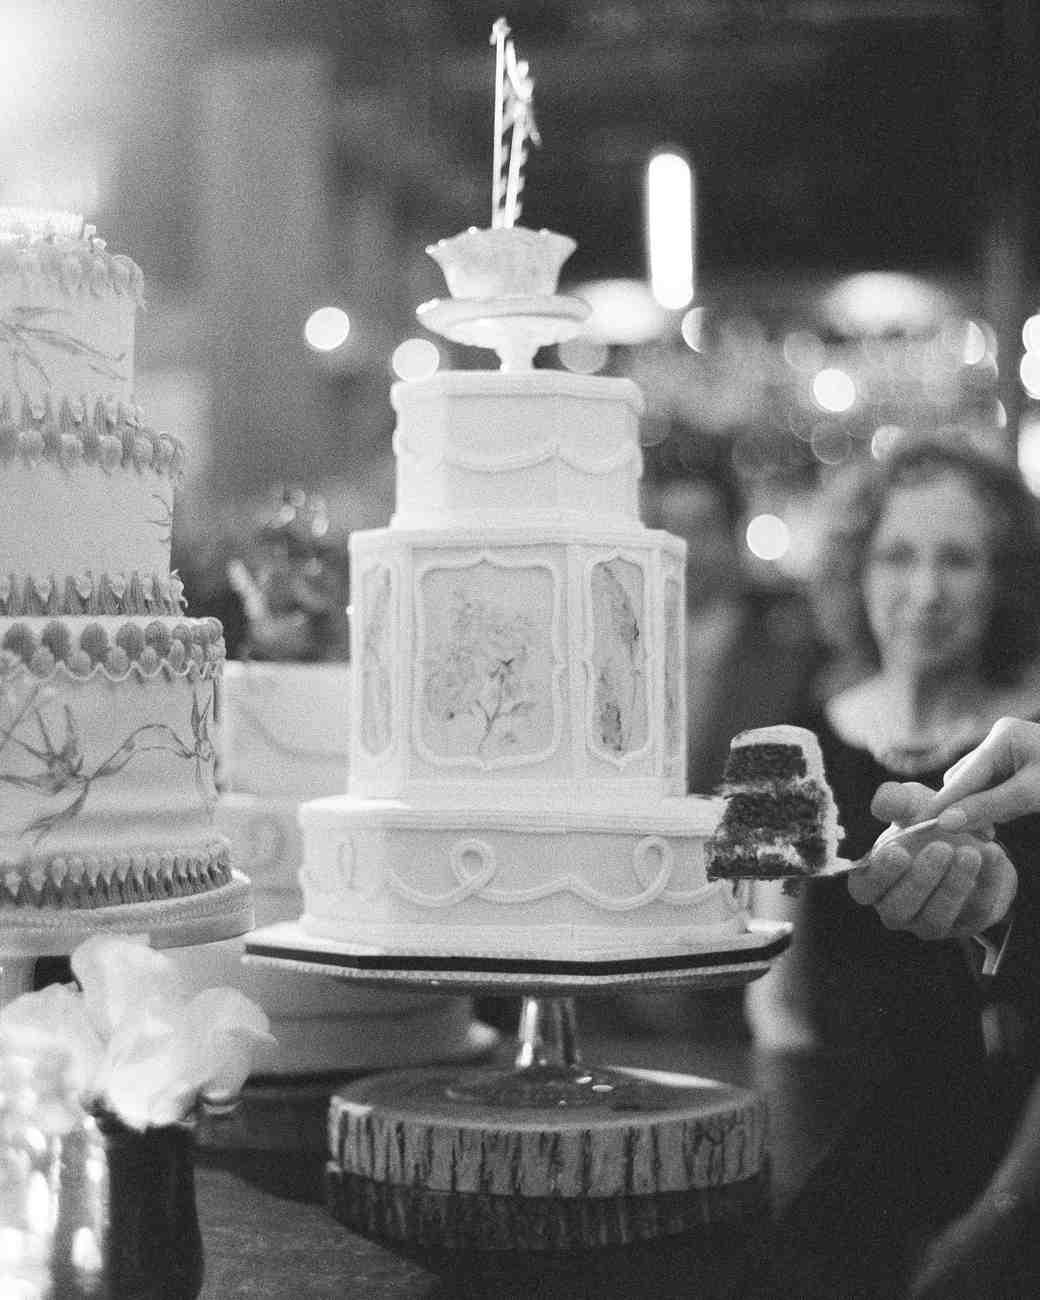 brittany-jeff-wedding-cake-291-s111415-0714.jpg